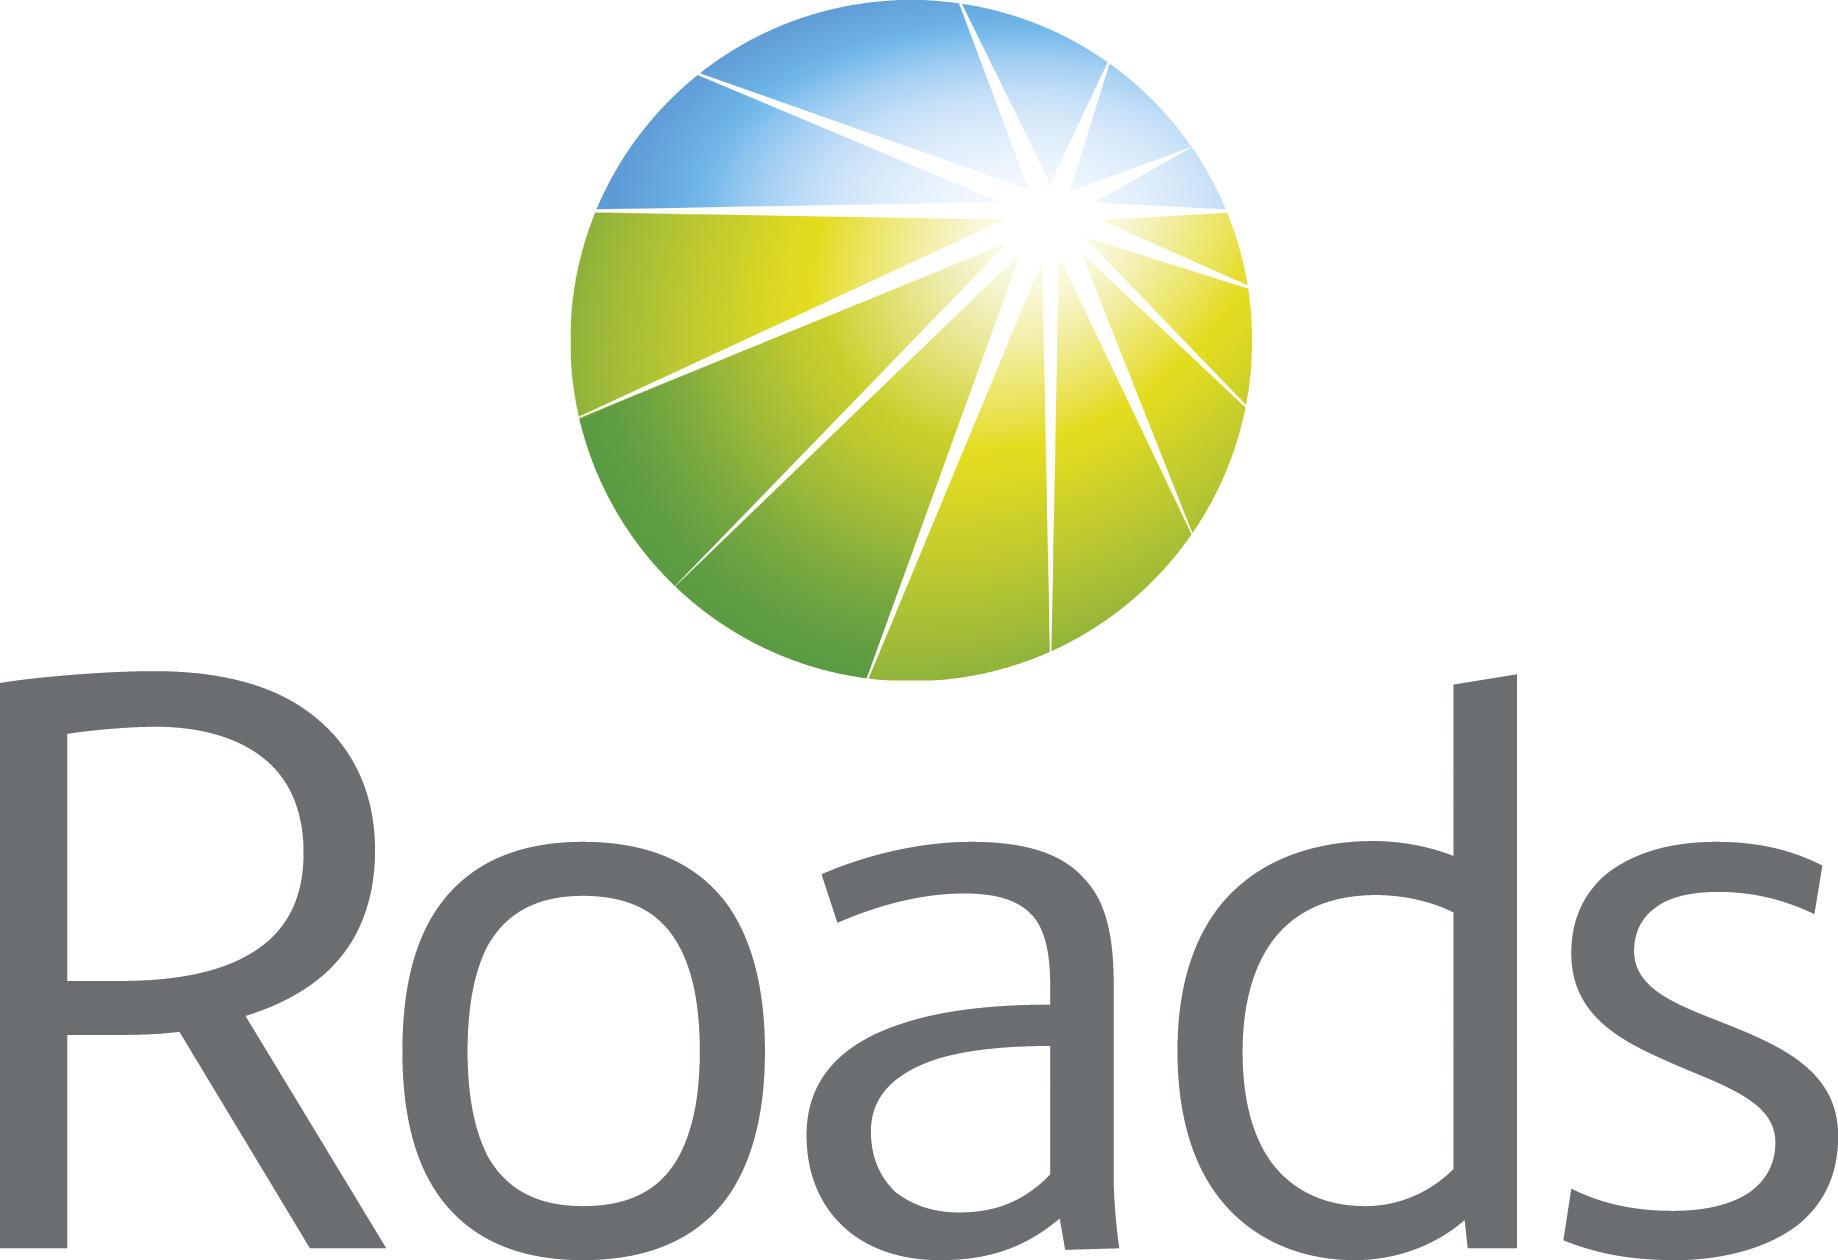 Roads logo